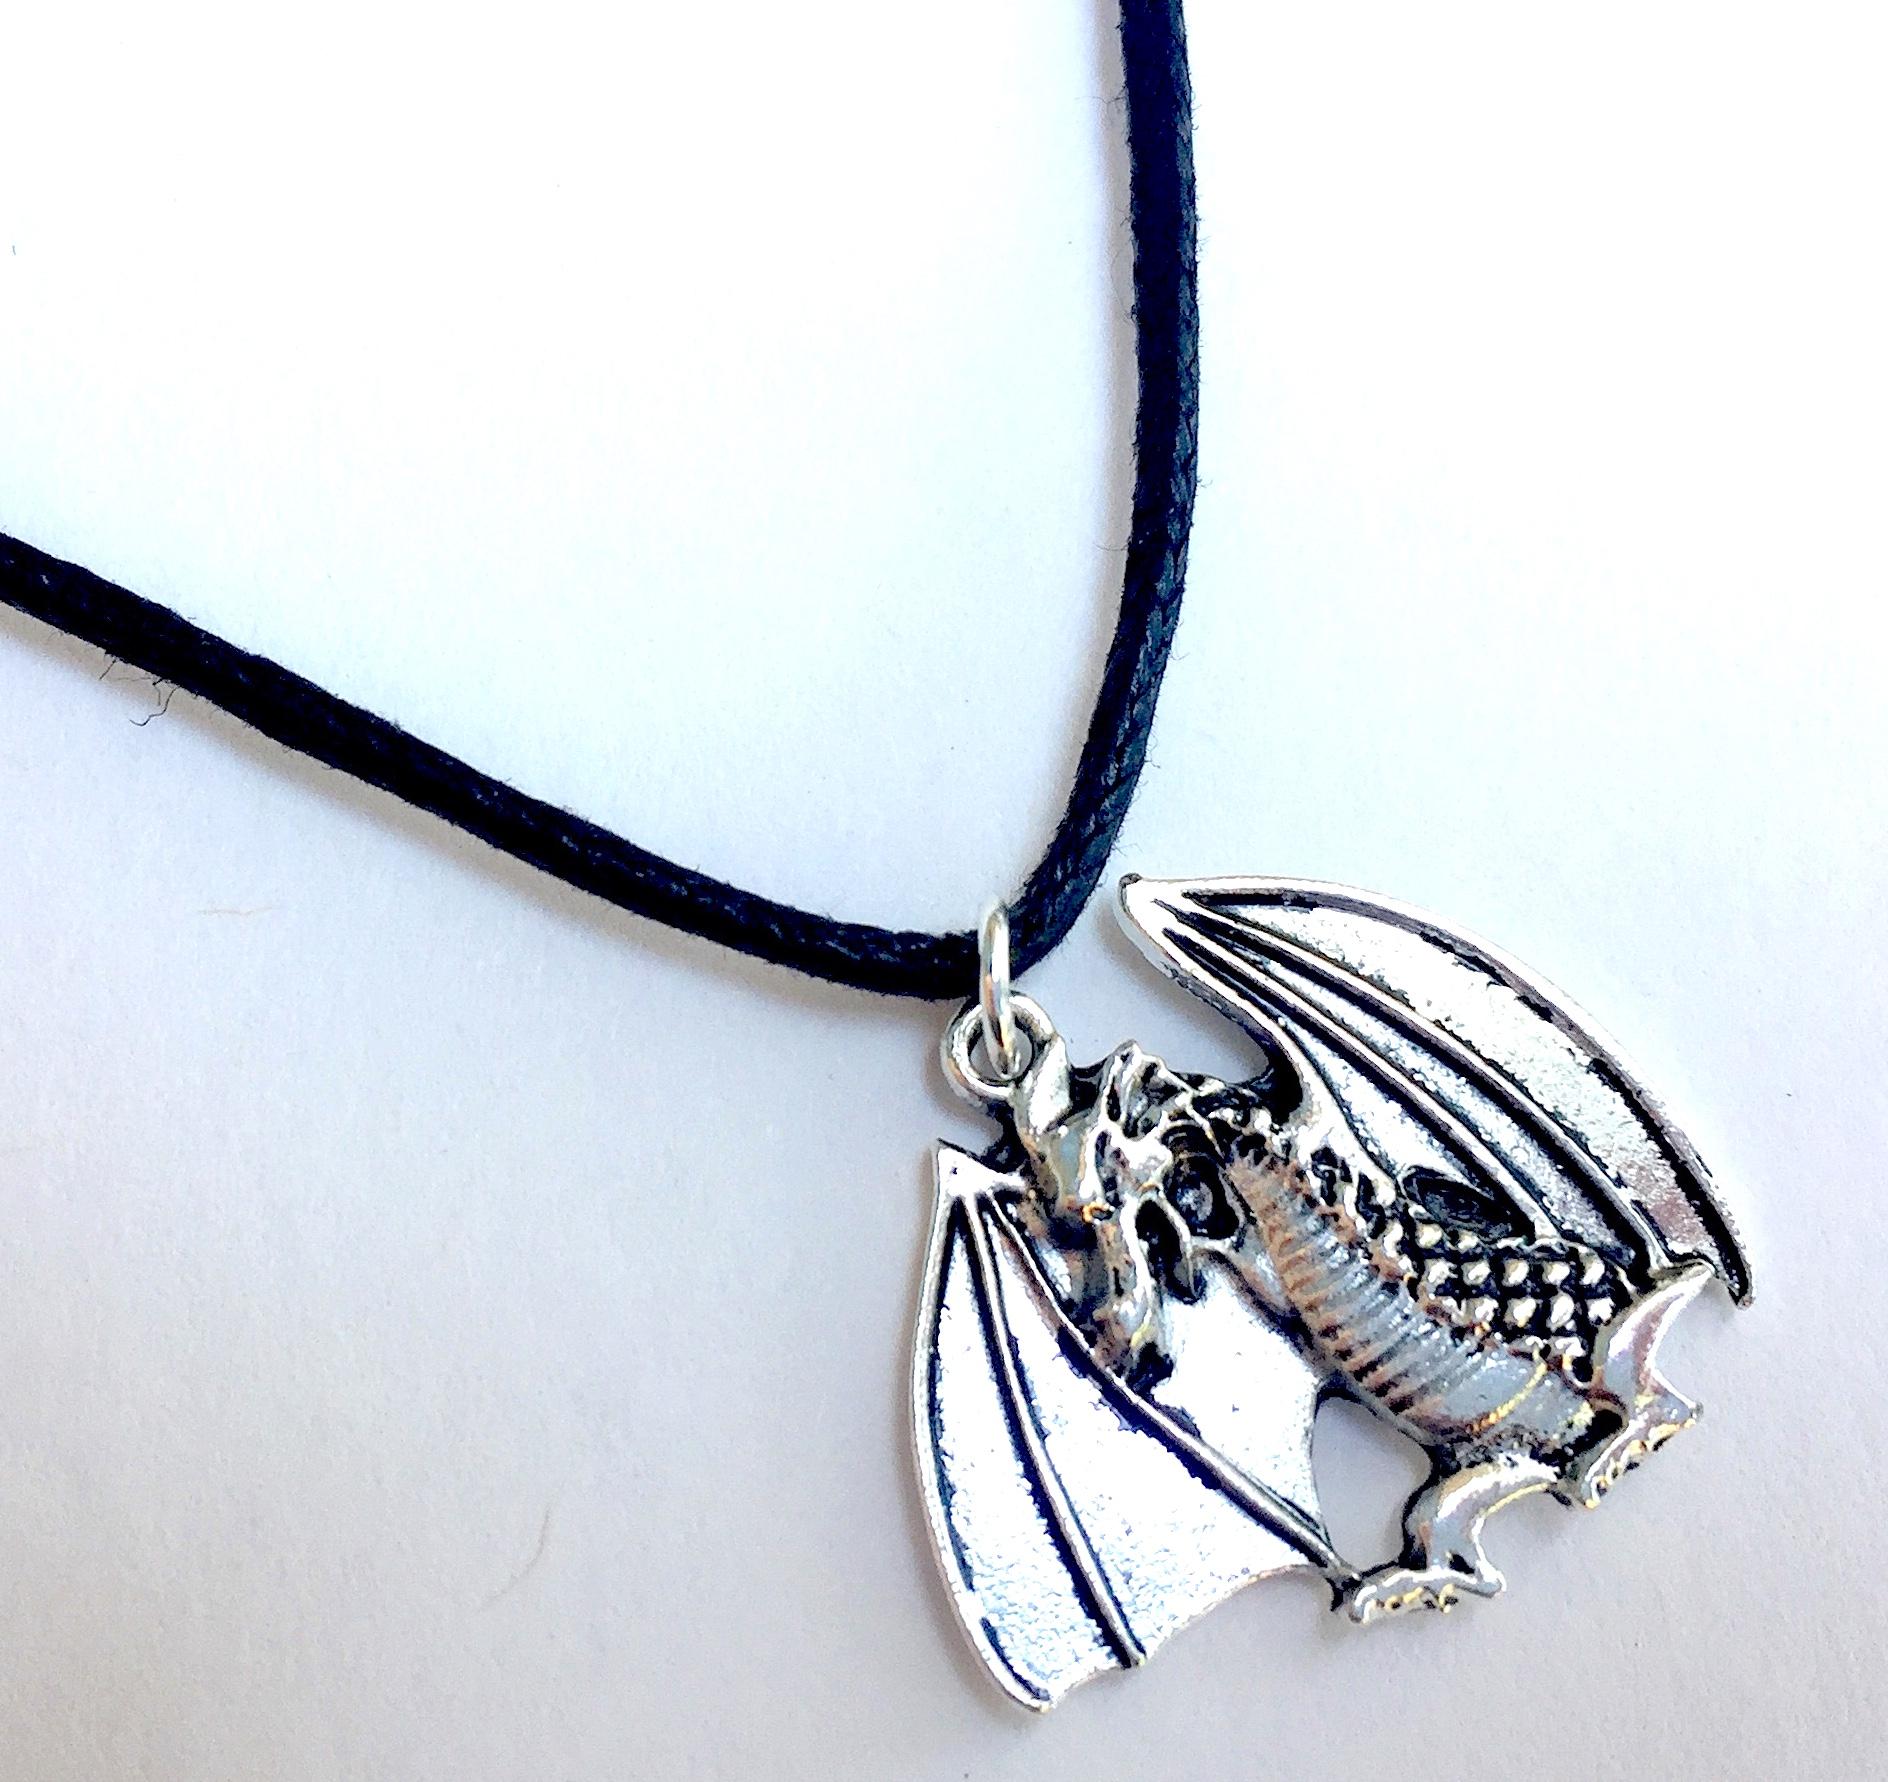 Fiery Dragon Necklace